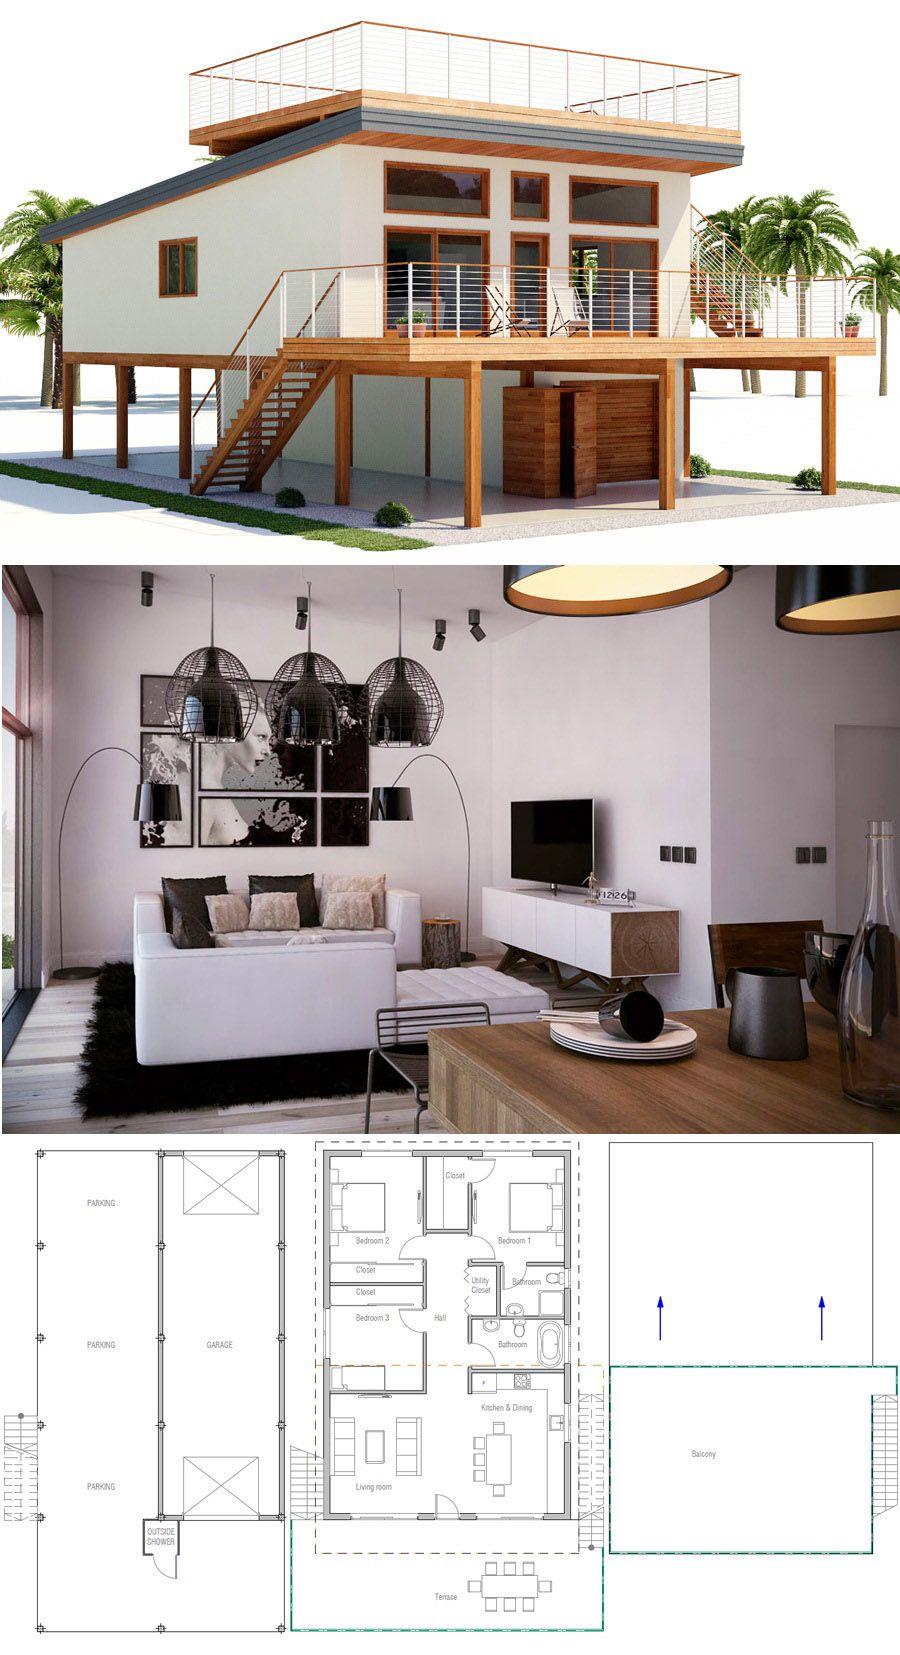 Architecture house designs home plans beach coastaldecor beachhousedecor also rh pinterest